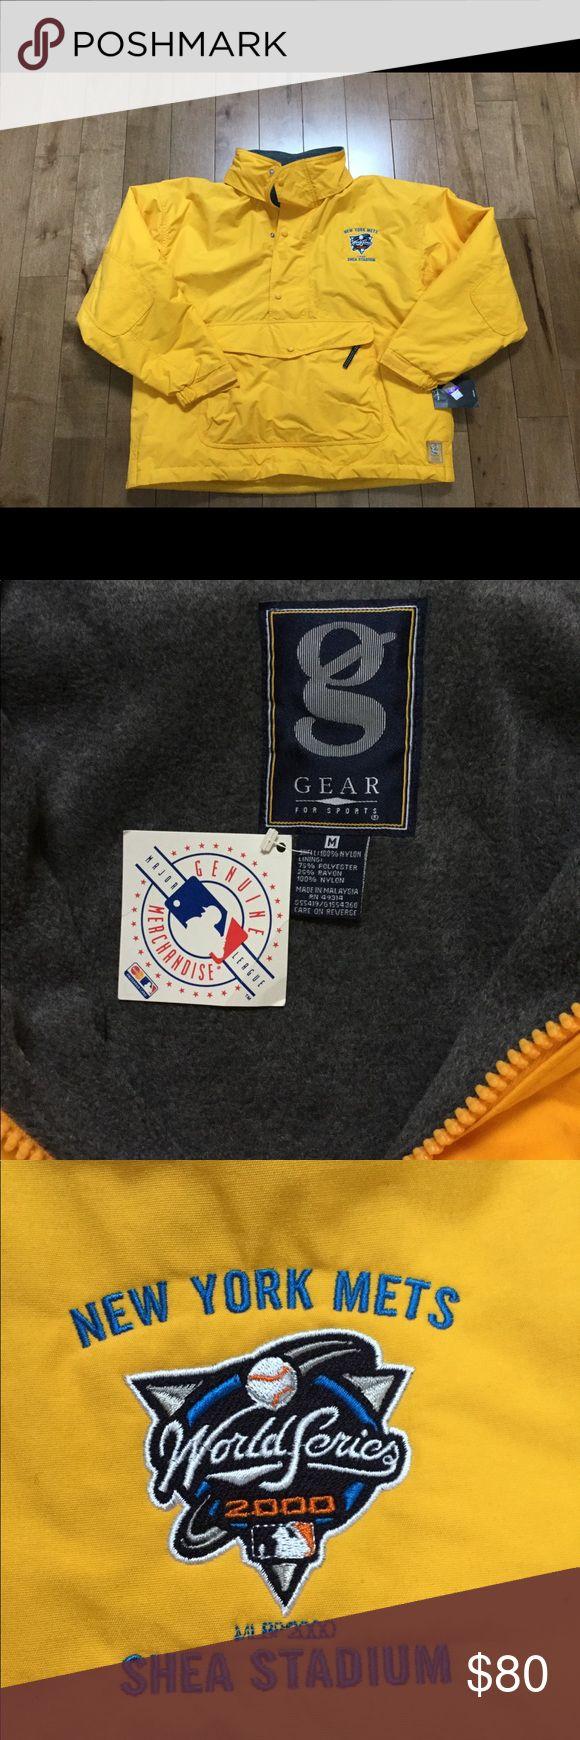 NY Mets 2000 World Series Pullover Jacket New with tag NY Mets year 2000 World Series Pullover Jacket.  Size M. NY Mets Jackets & Coats Performance Jackets